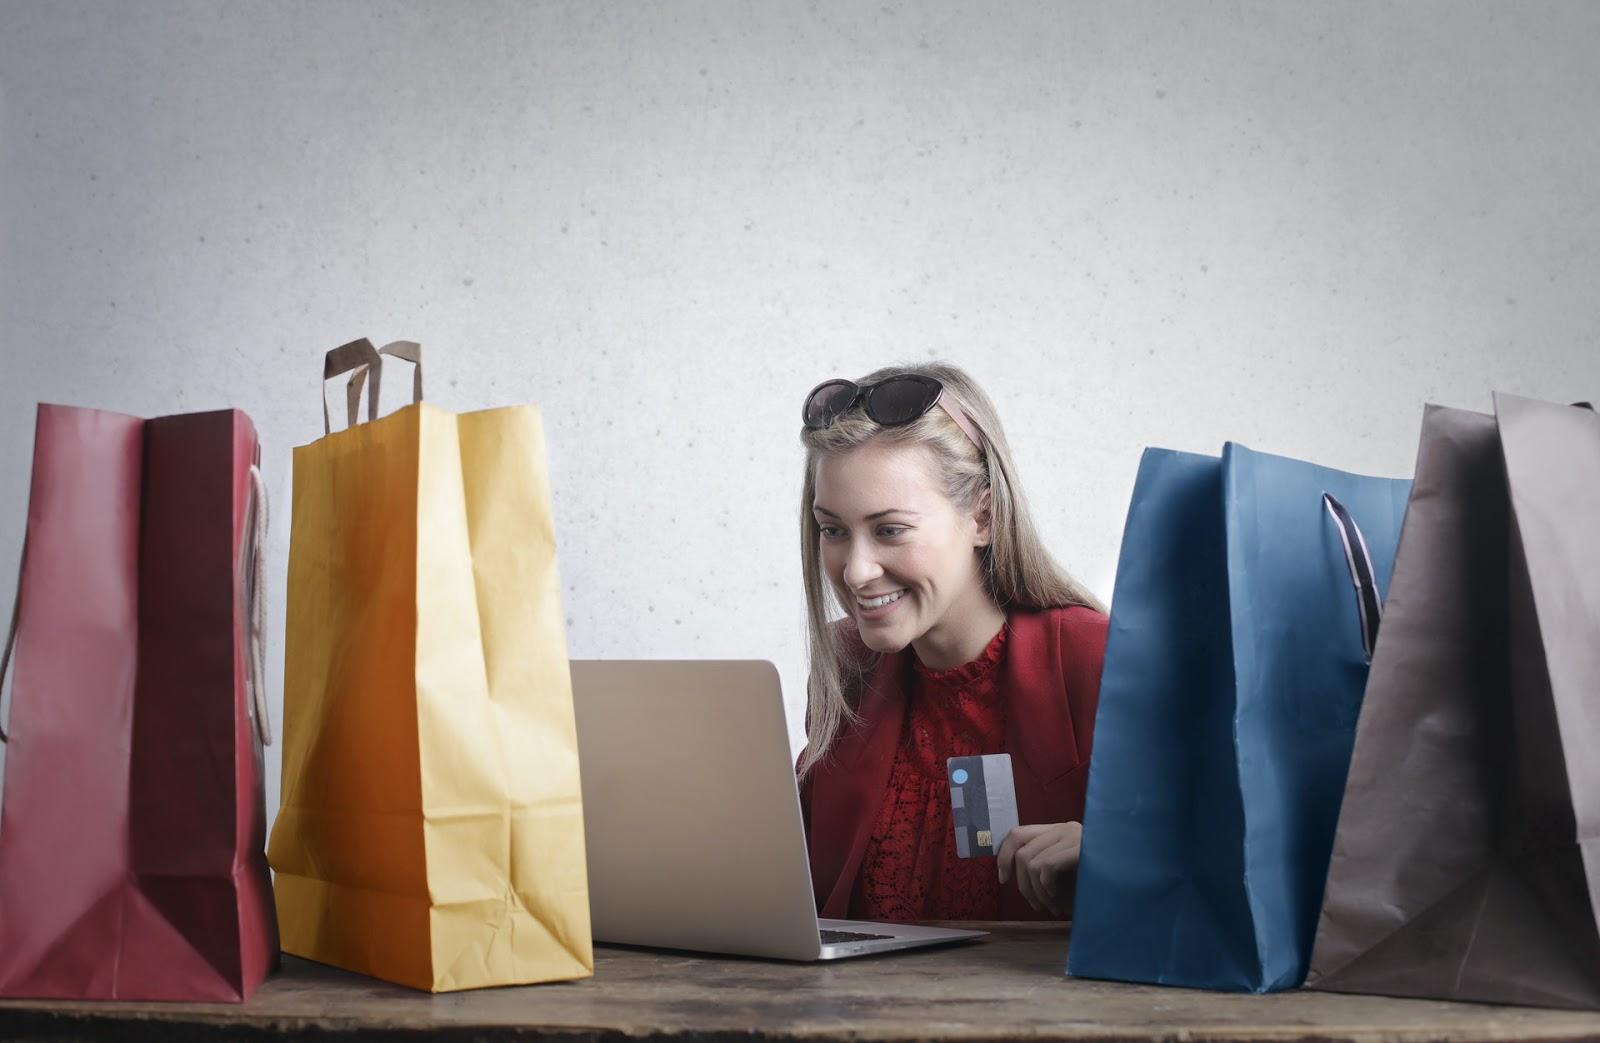 women-online-shopping-on-laptop